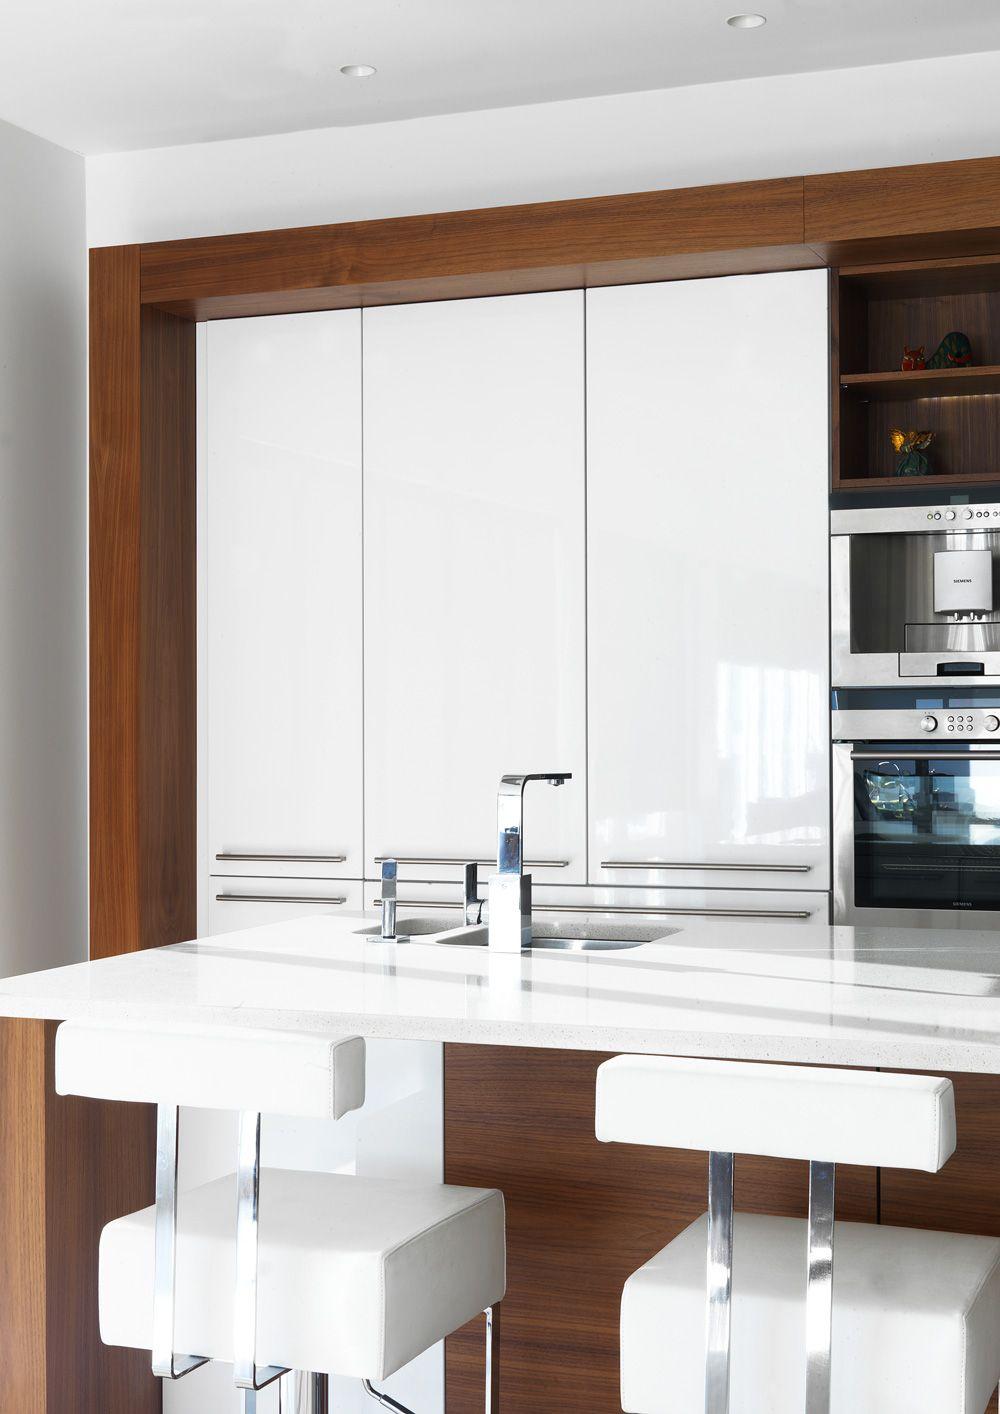 Hans Krug - Modern Cabinet Designs - Kitchen Cabinets ...